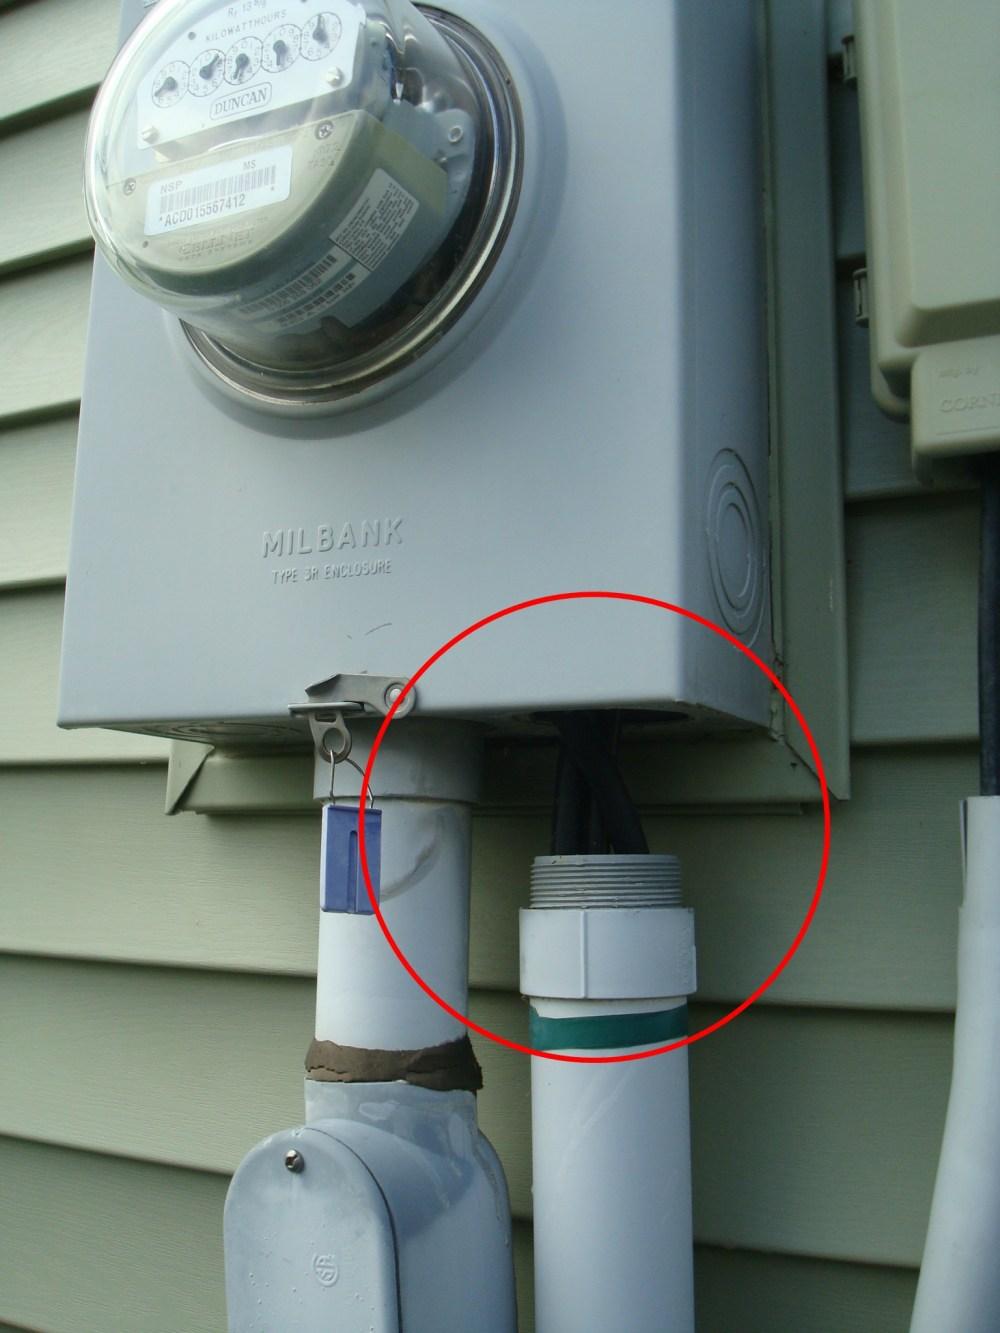 medium resolution of house meter box wiring wiring diagrams meter base wiring diagram house meter box wiring